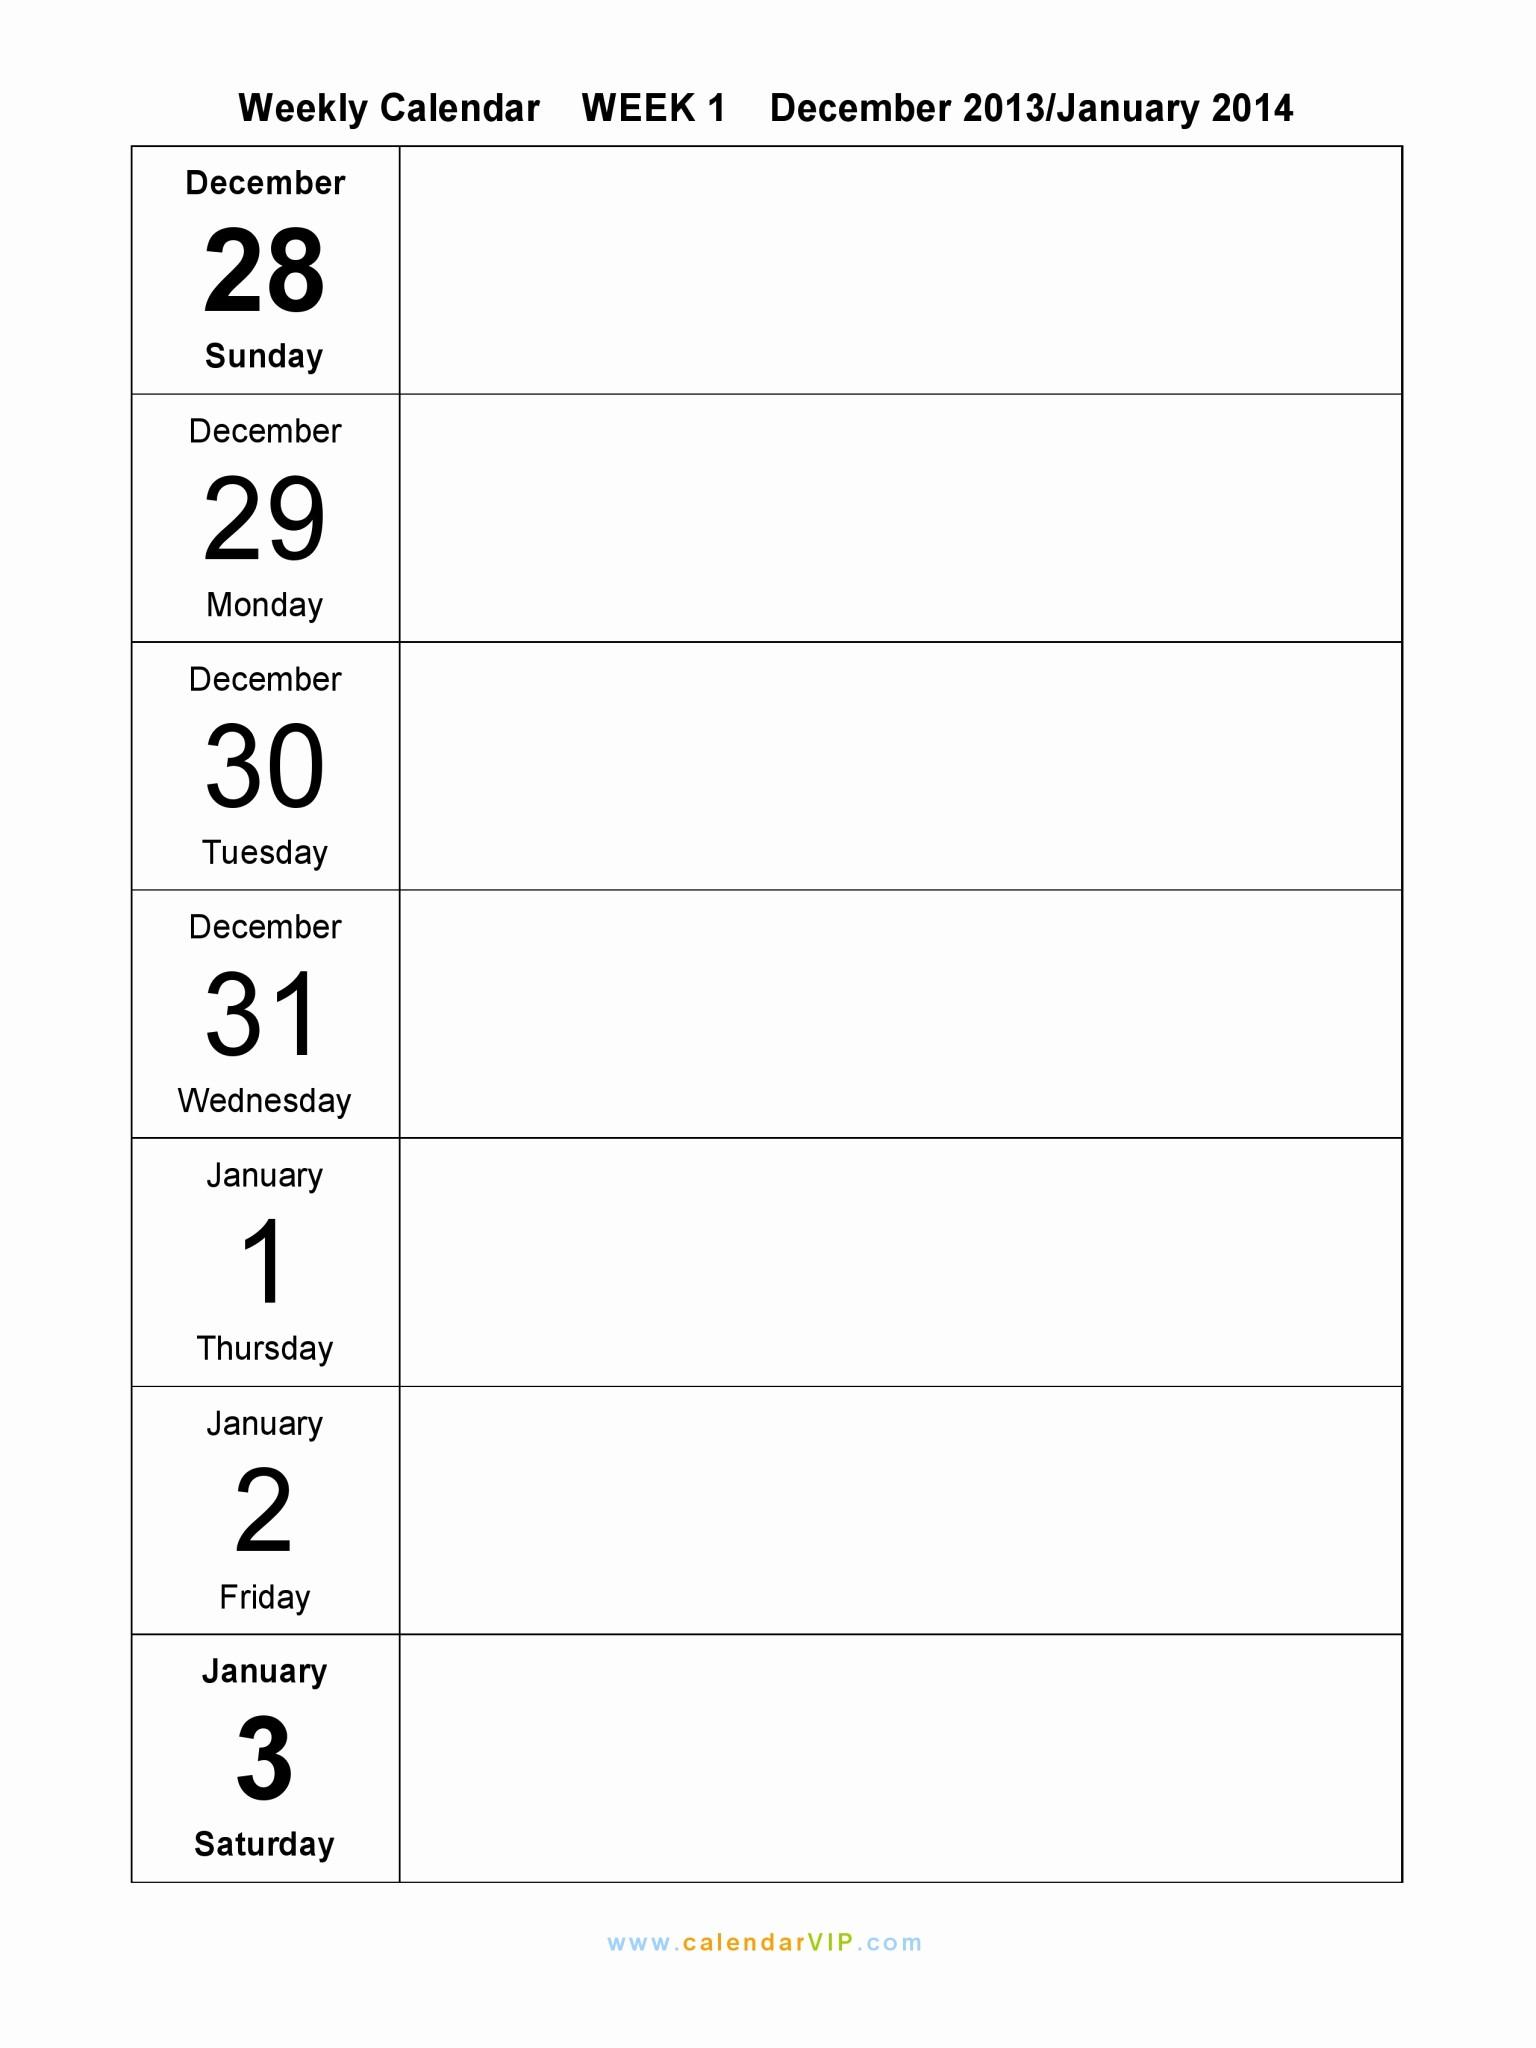 Week by Week Calendar Template Inspirational Weekly Calendar 2015 Free Weekly Calendar Templates